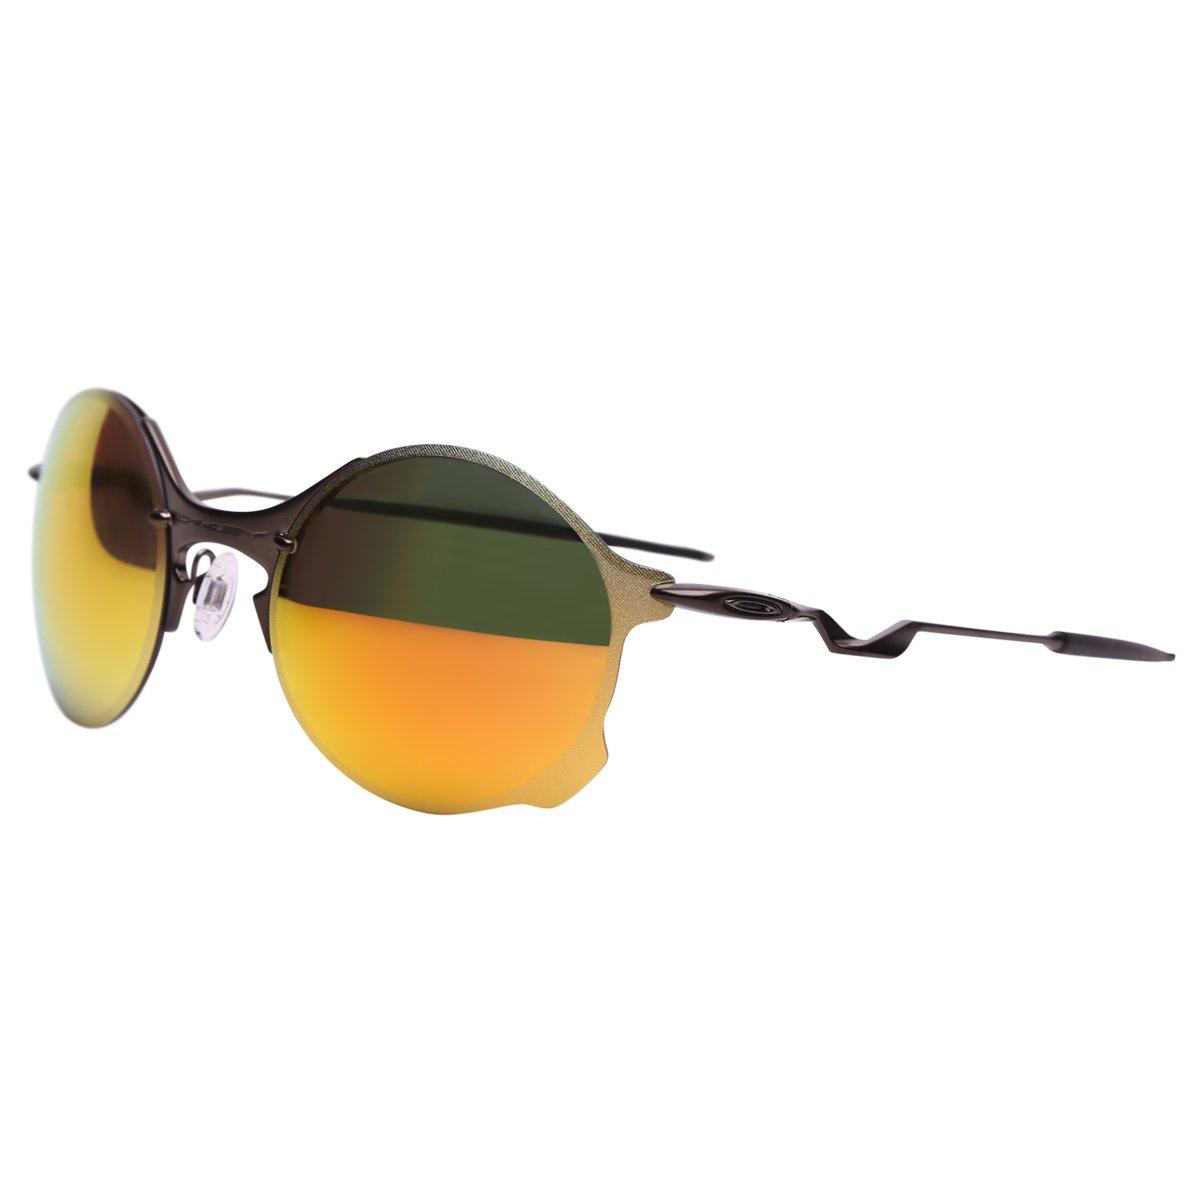 a9bcafe250d8d Óculos Oakley Tailend Pewter-Iridium-OO4088 - Compre Agora   Netshoes